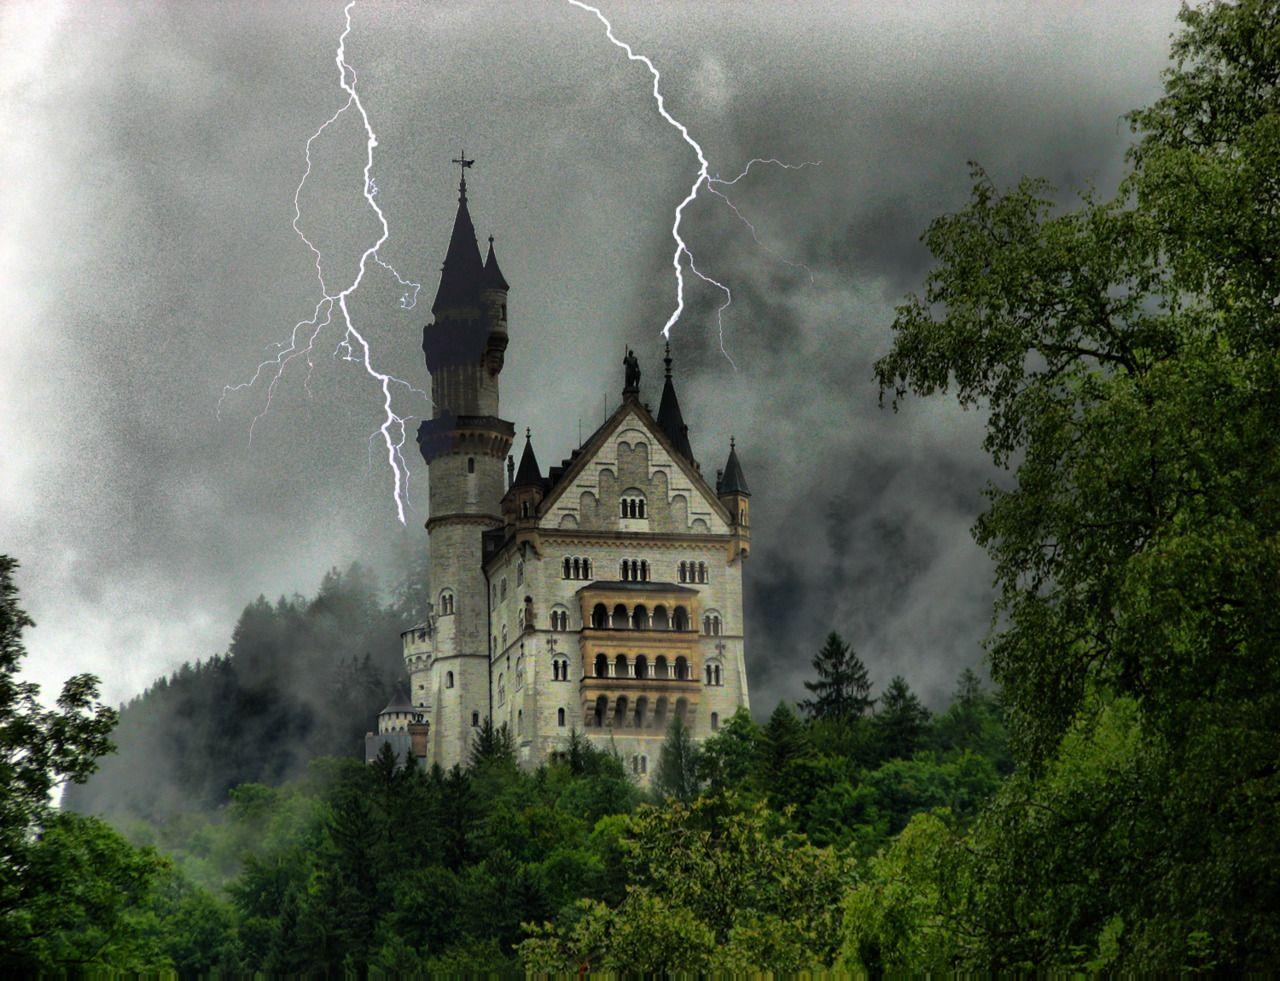 O Castelo Dos Contos De Terror 0 Deutschland Burgen Beruhmte Schlosser Neuschwanstein